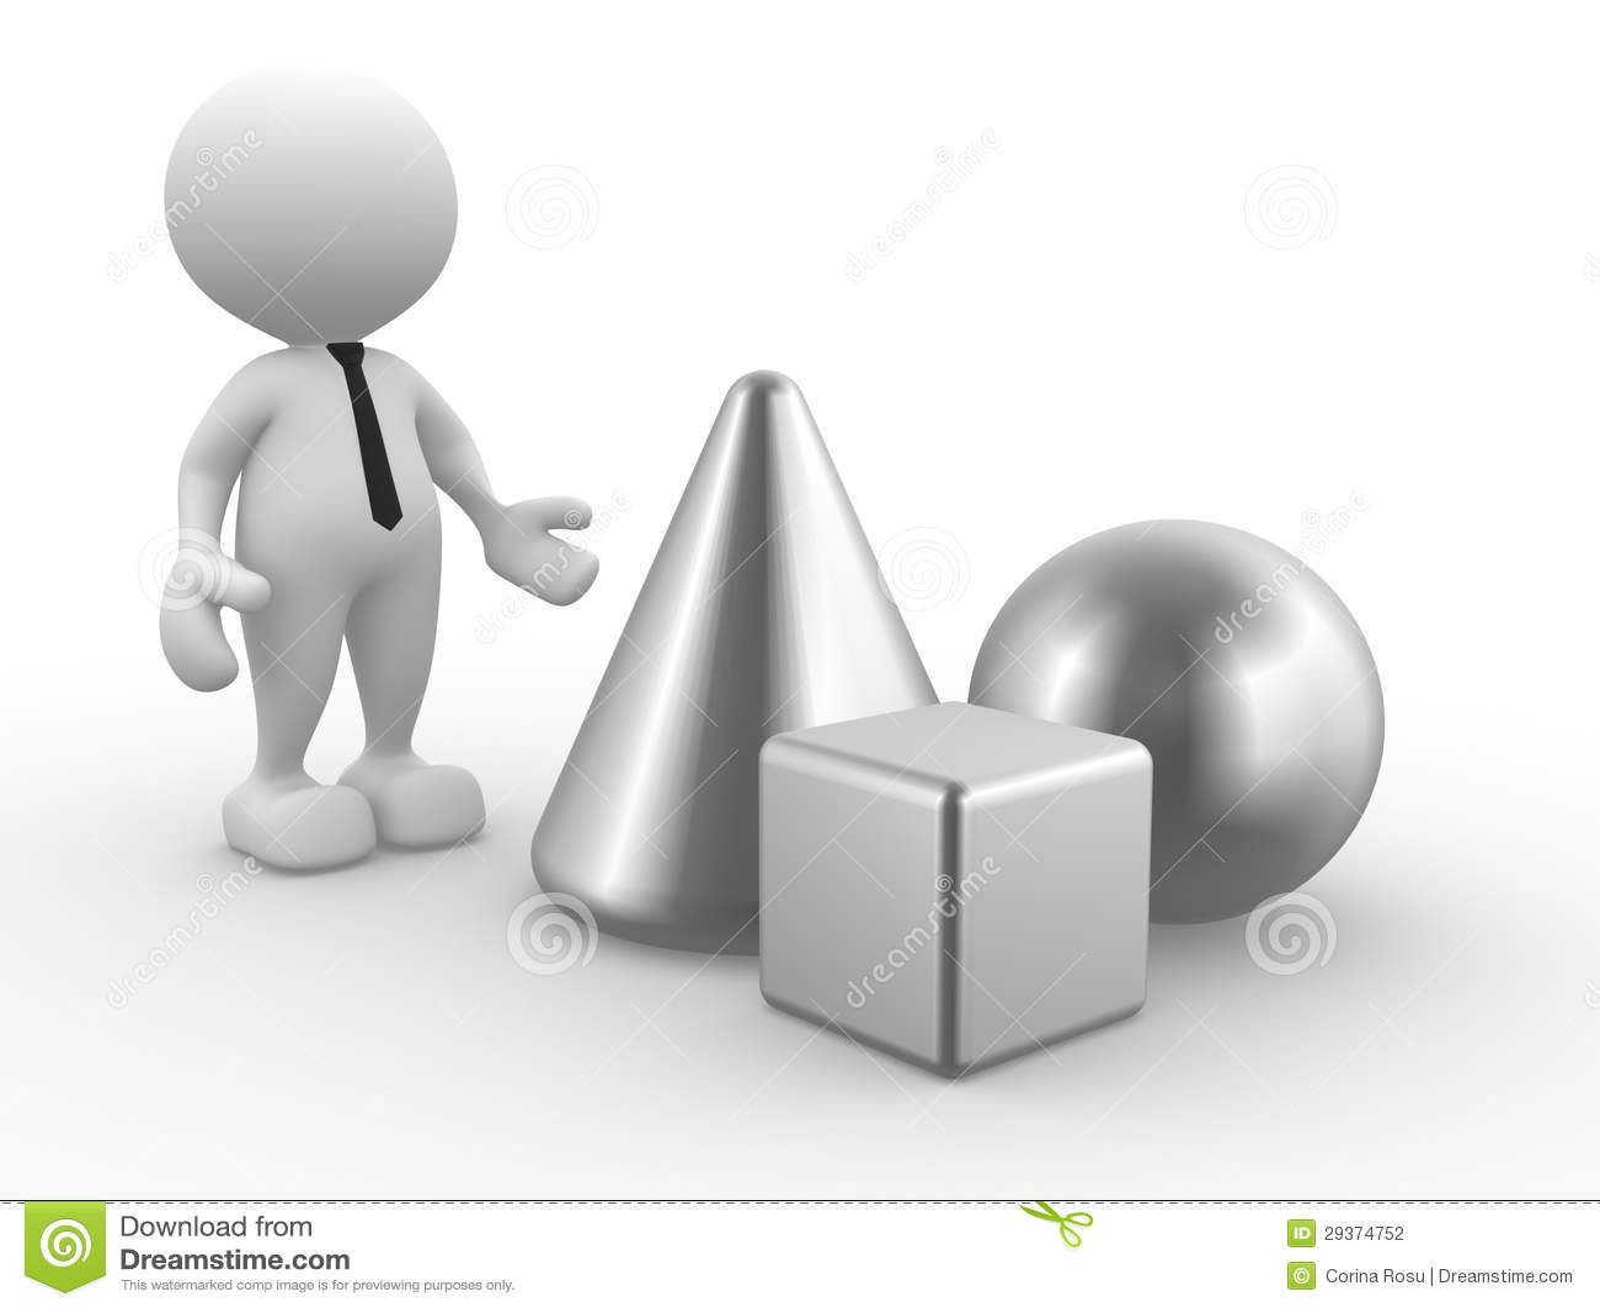 geometrische formen stockfotografie bild 29374752. Black Bedroom Furniture Sets. Home Design Ideas